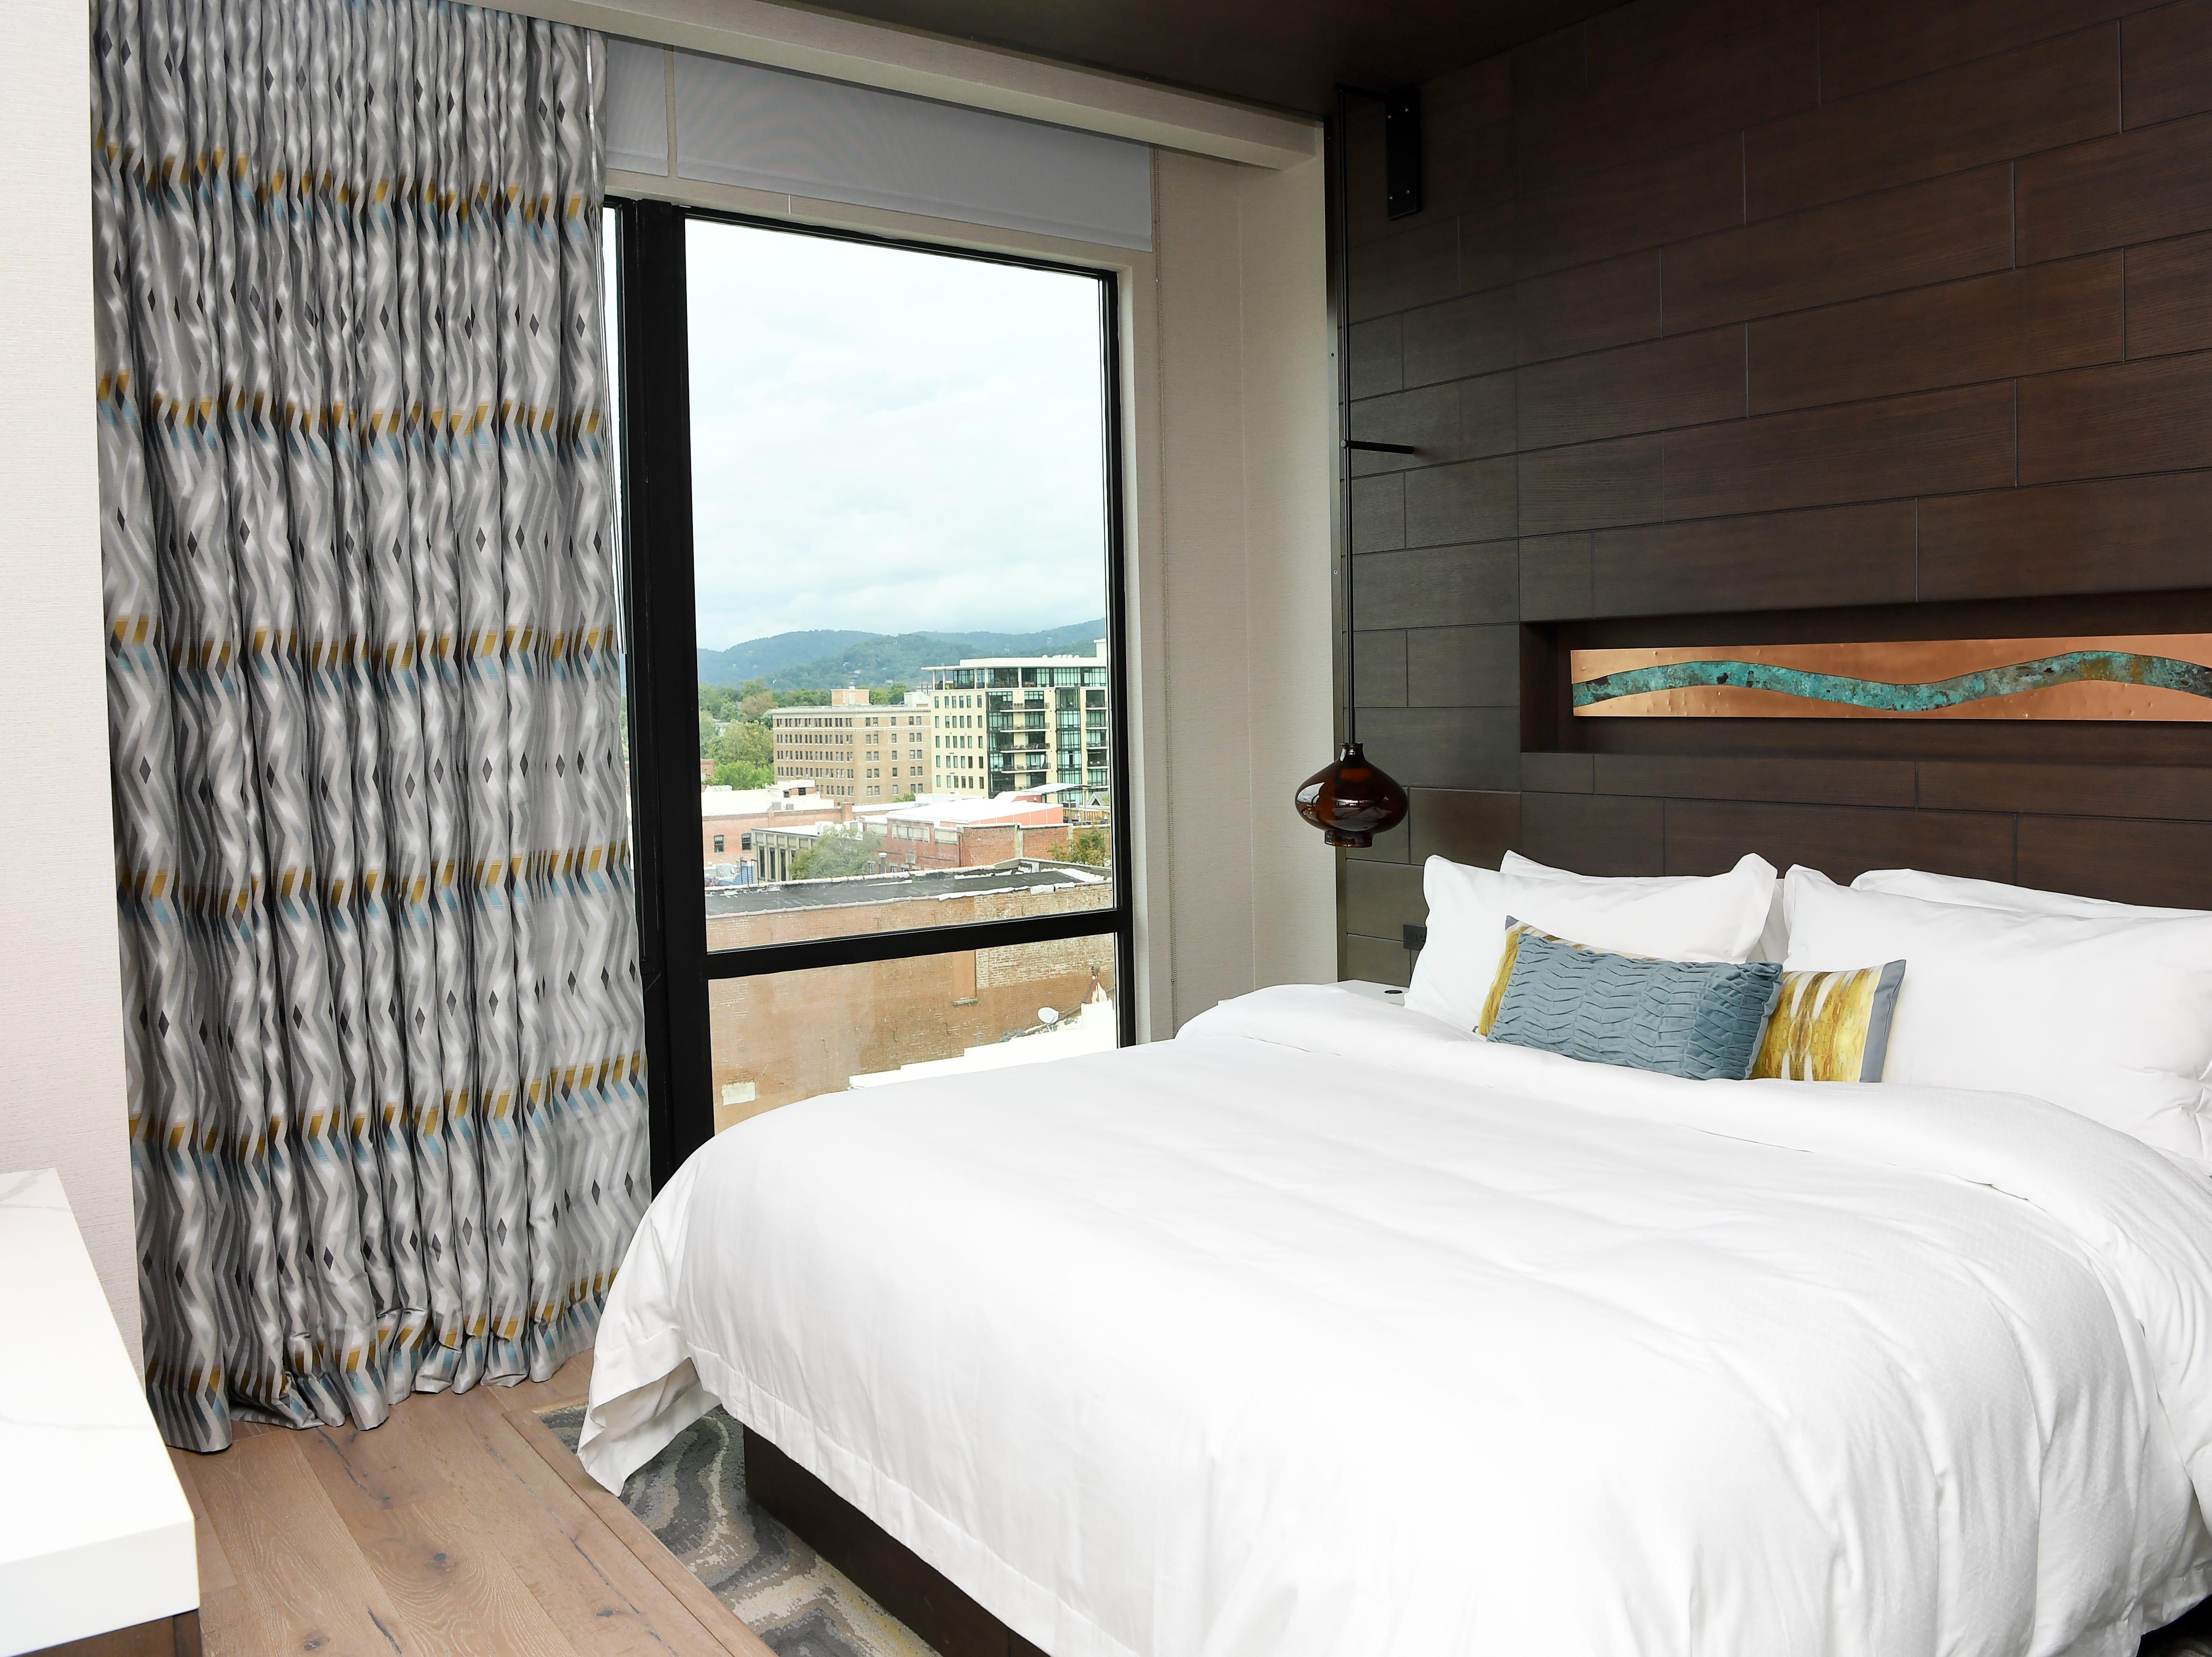 A suite inside Hotel Arras Sept. 27, 2018.